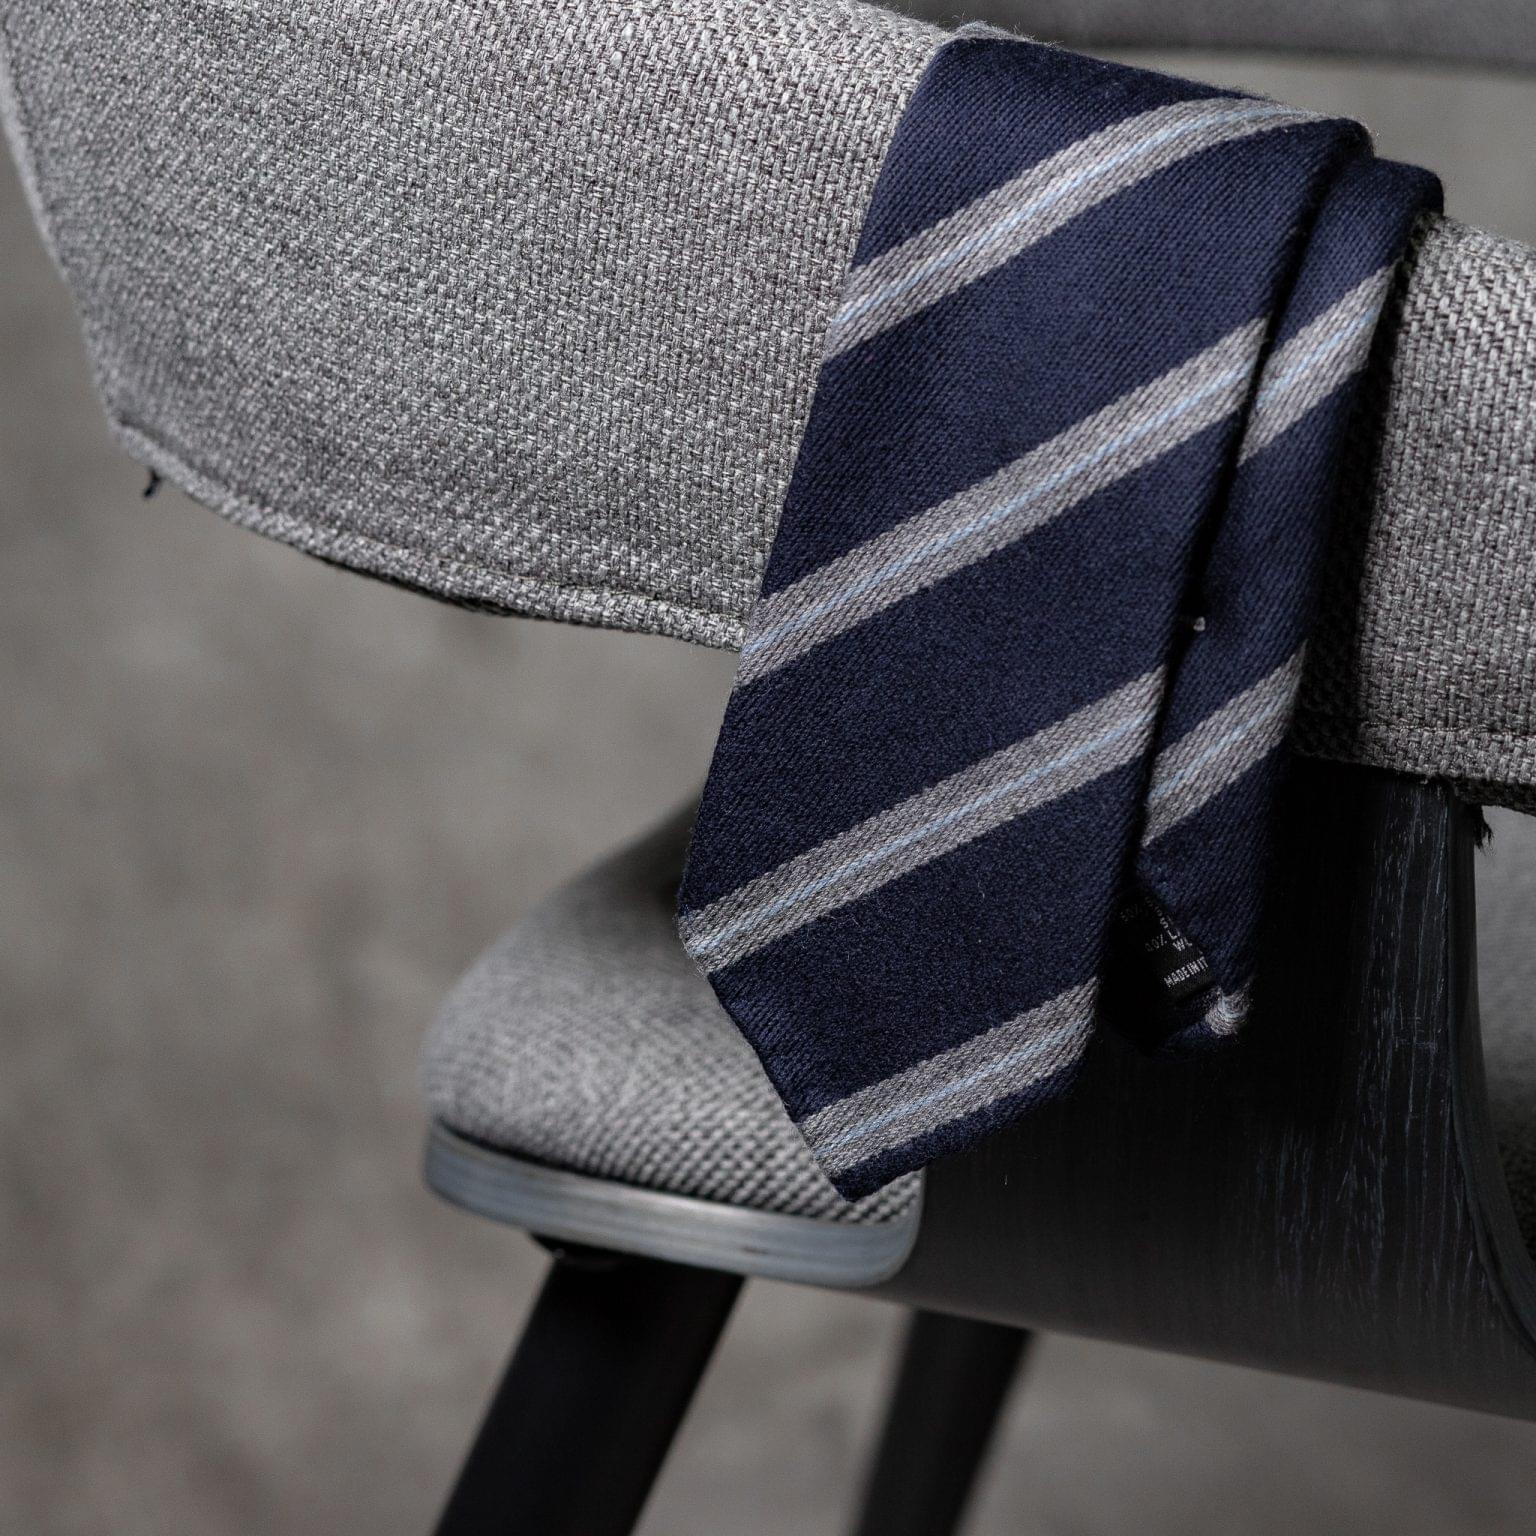 WOOL-LANA-0510-Tie-Initials-Corbata-Iniciales-The-Seelk-2